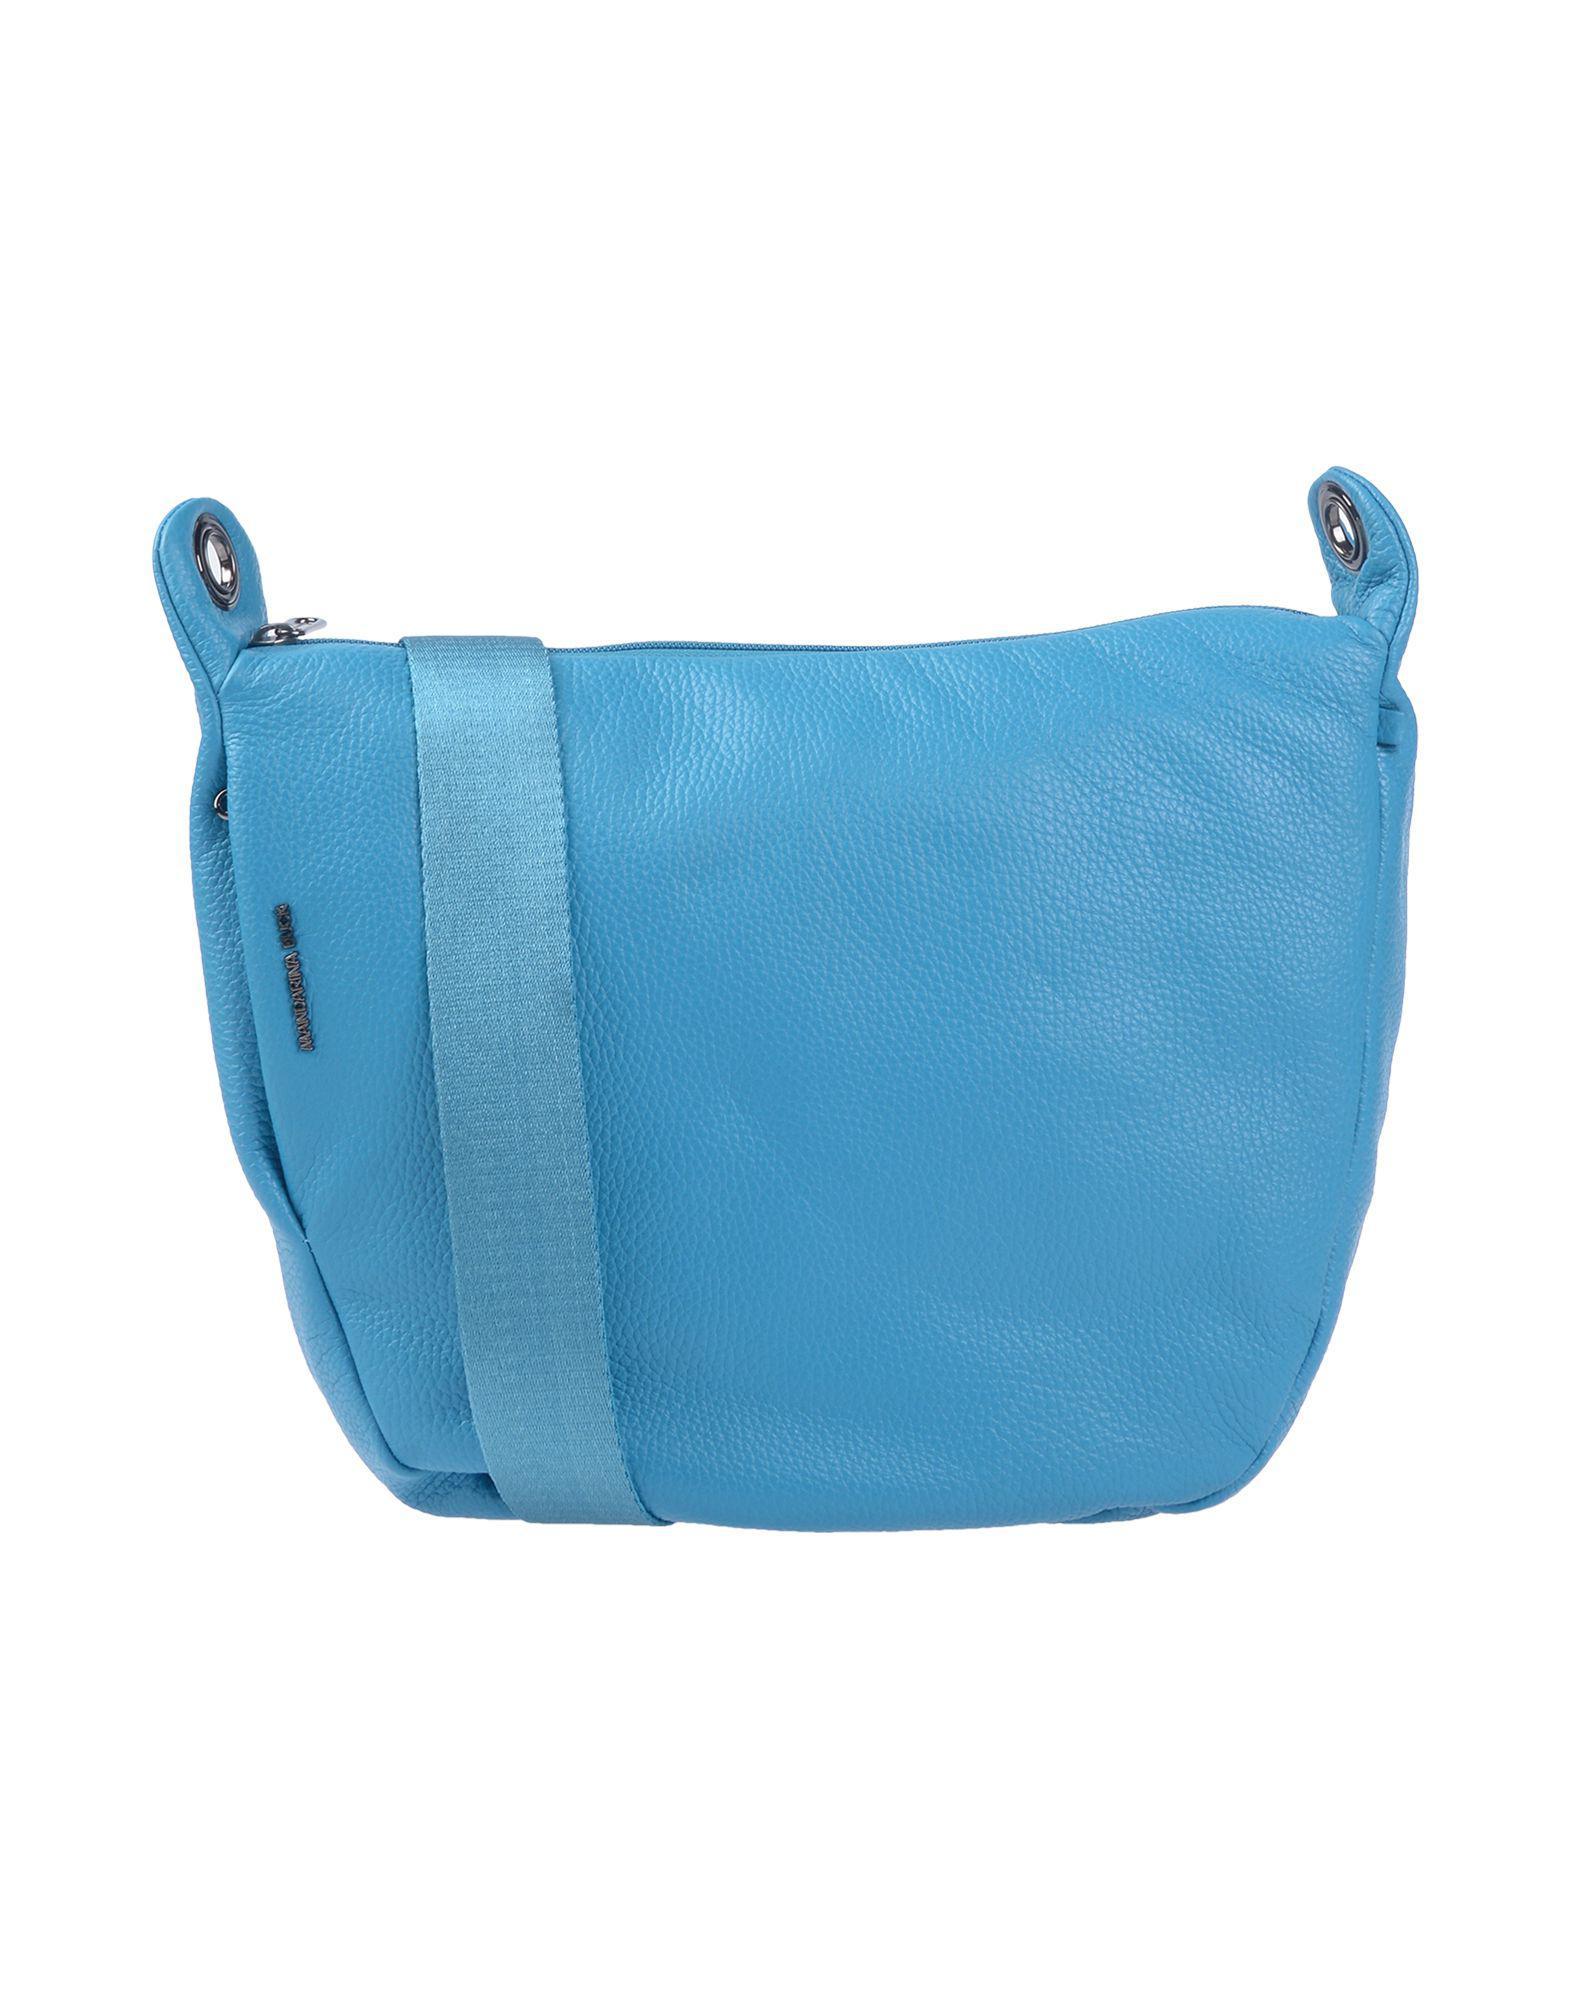 892a3fef1 Mandarina Duck. Bolso con bandolera de mujer de color azul